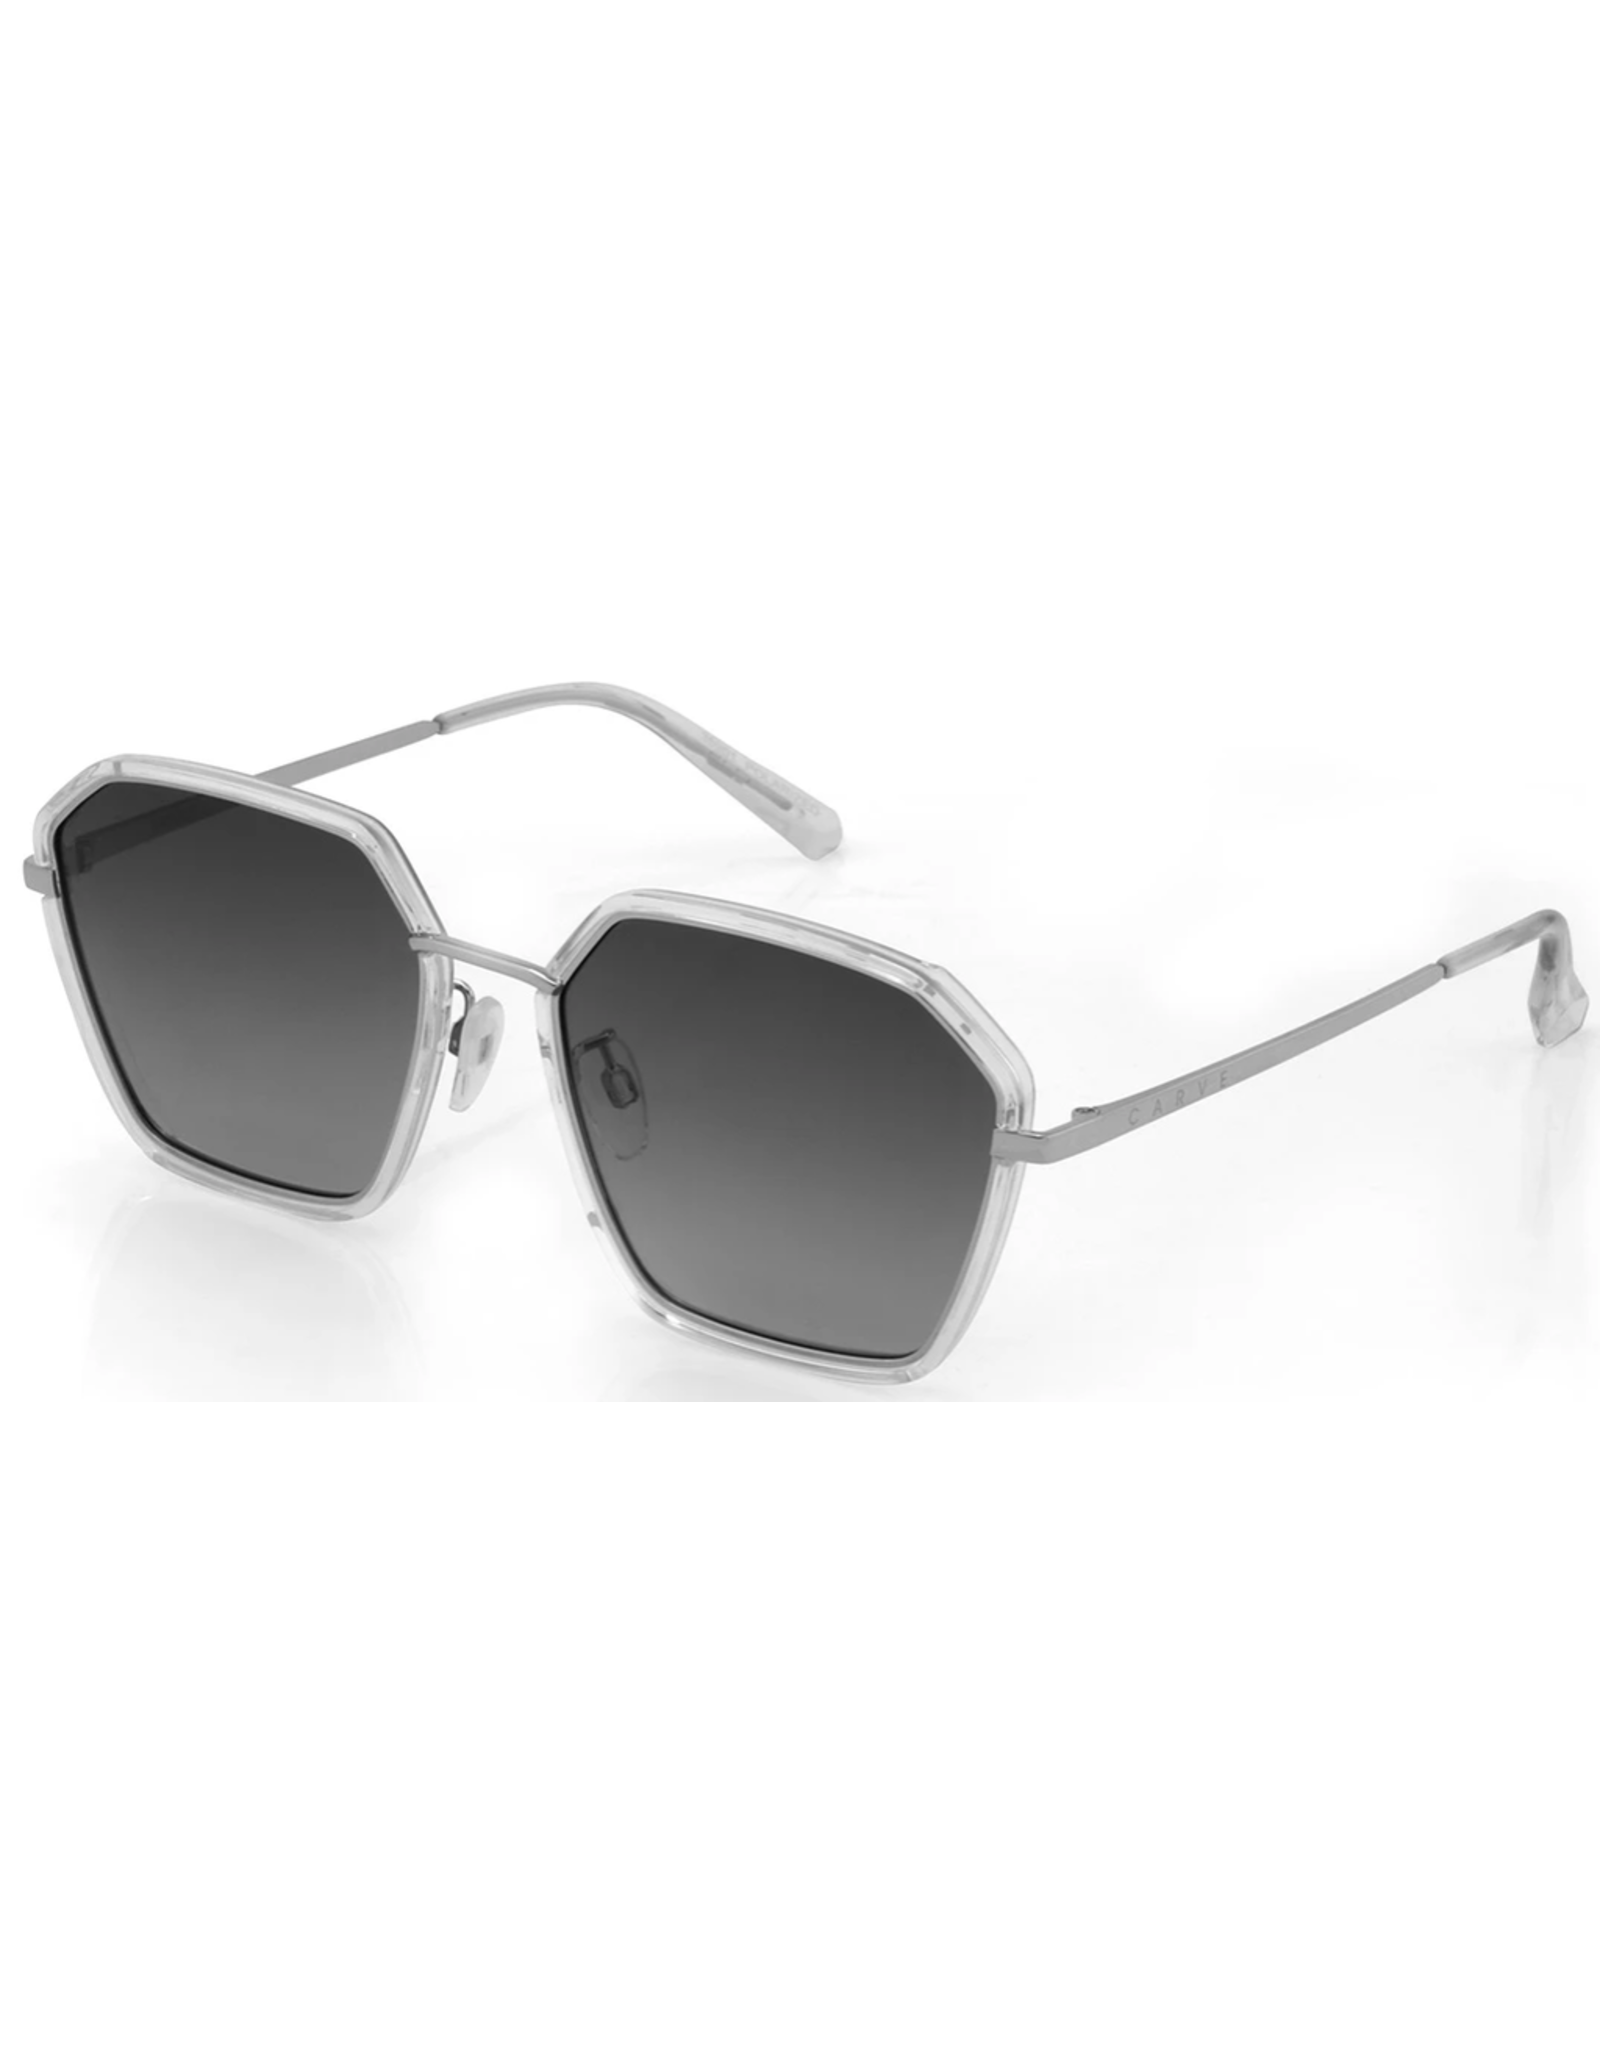 CARVE SUNGLASSES CARVE BARDOT Polarized Sunglasses